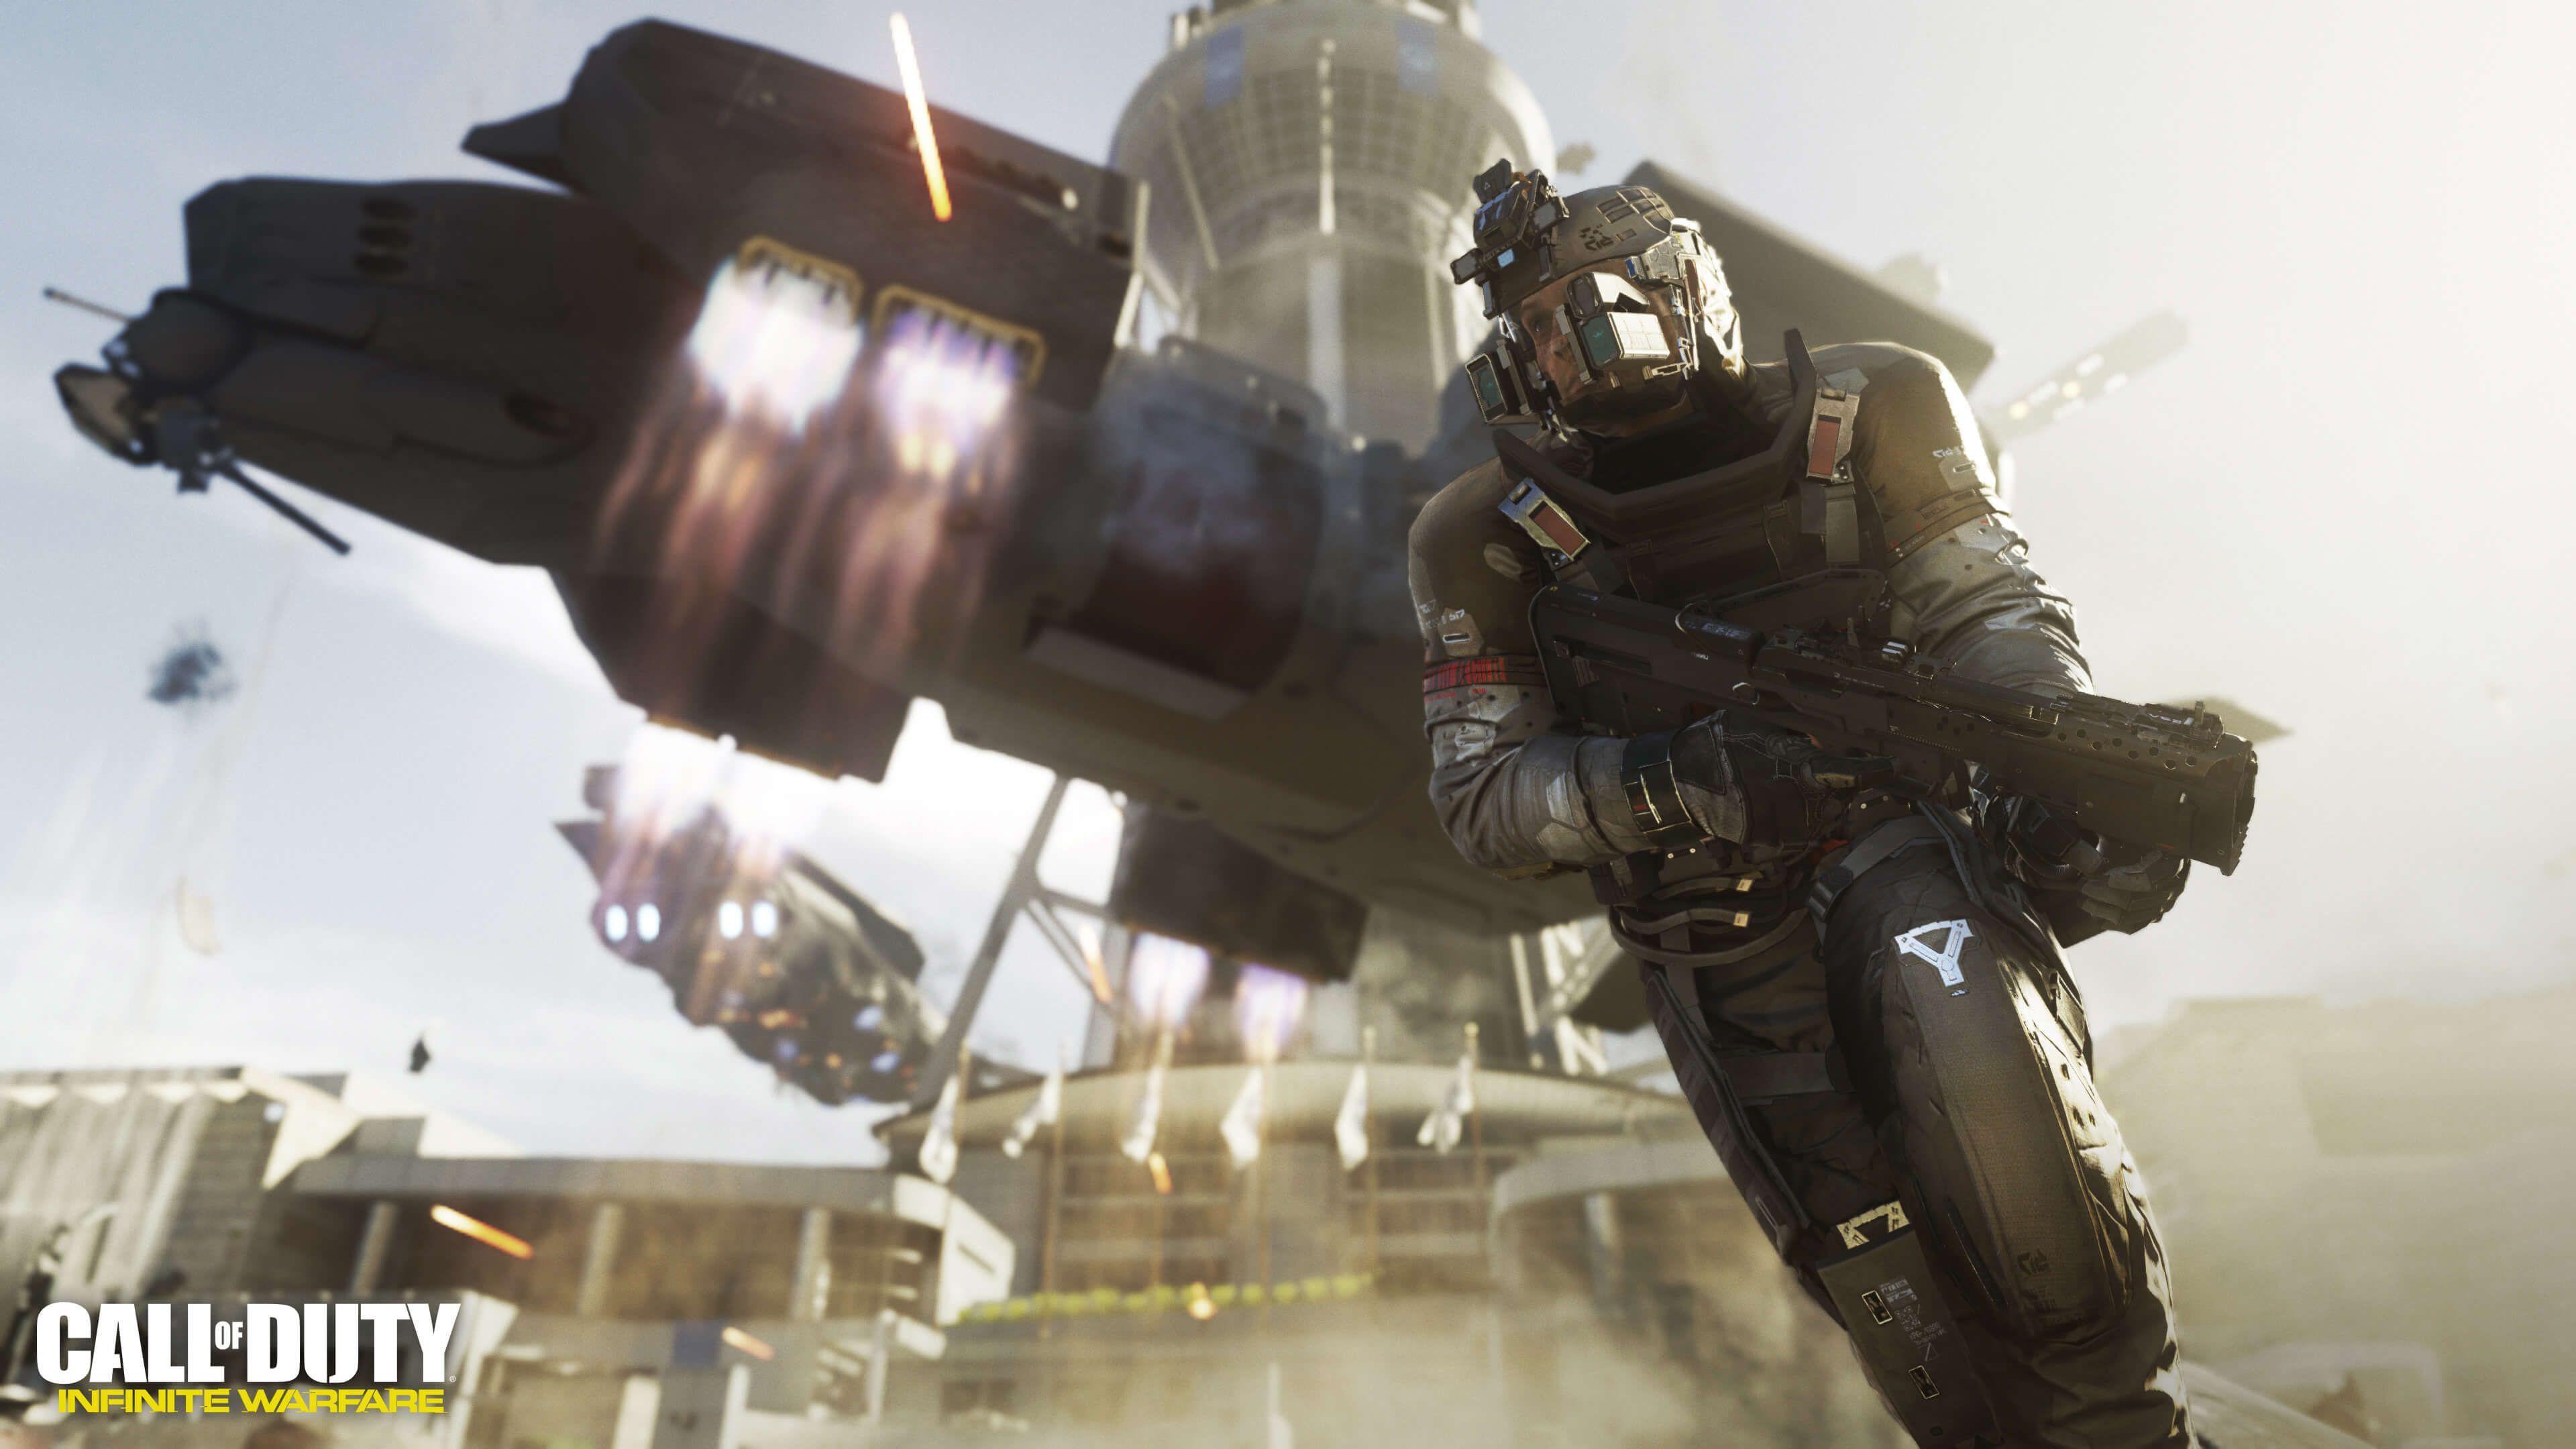 Call Of Duty Infinite Warfare Wallpaper